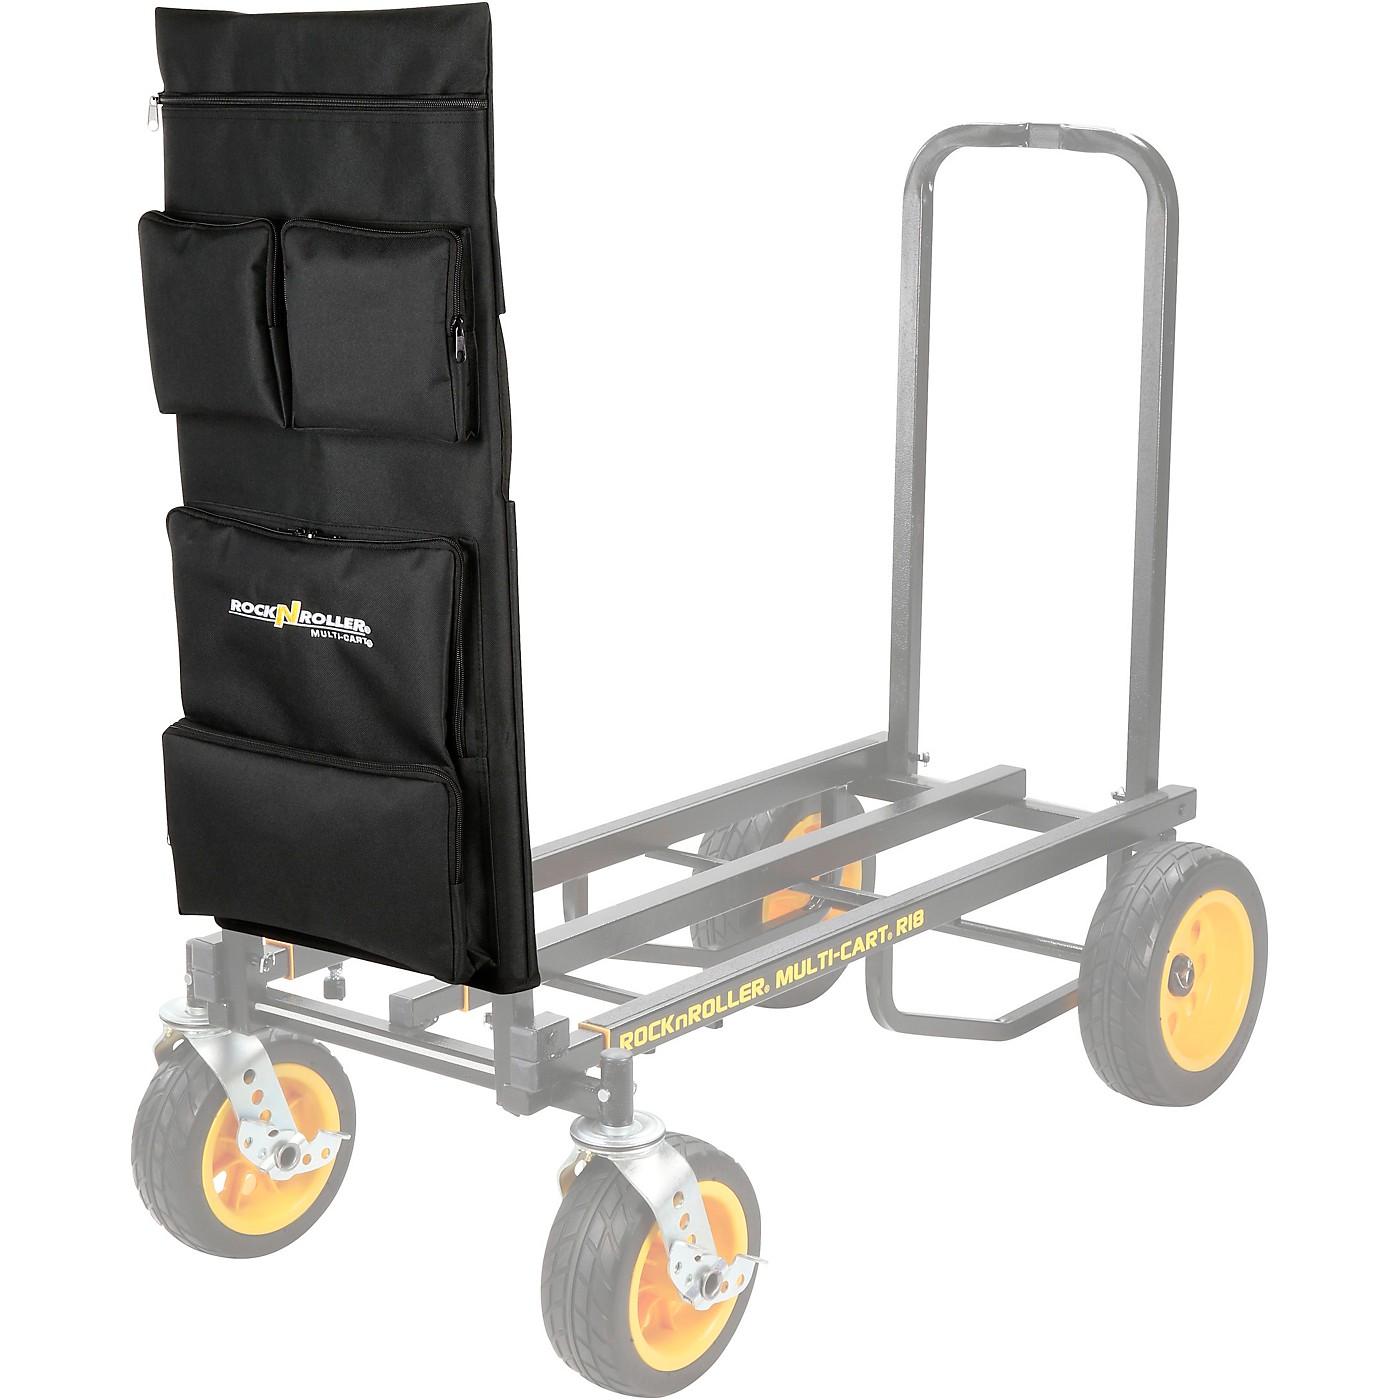 Rock N Roller RSA-TAB14 Large Multi-Pocket Tool/Accessory Bag for R14, R16, R18 Carts thumbnail